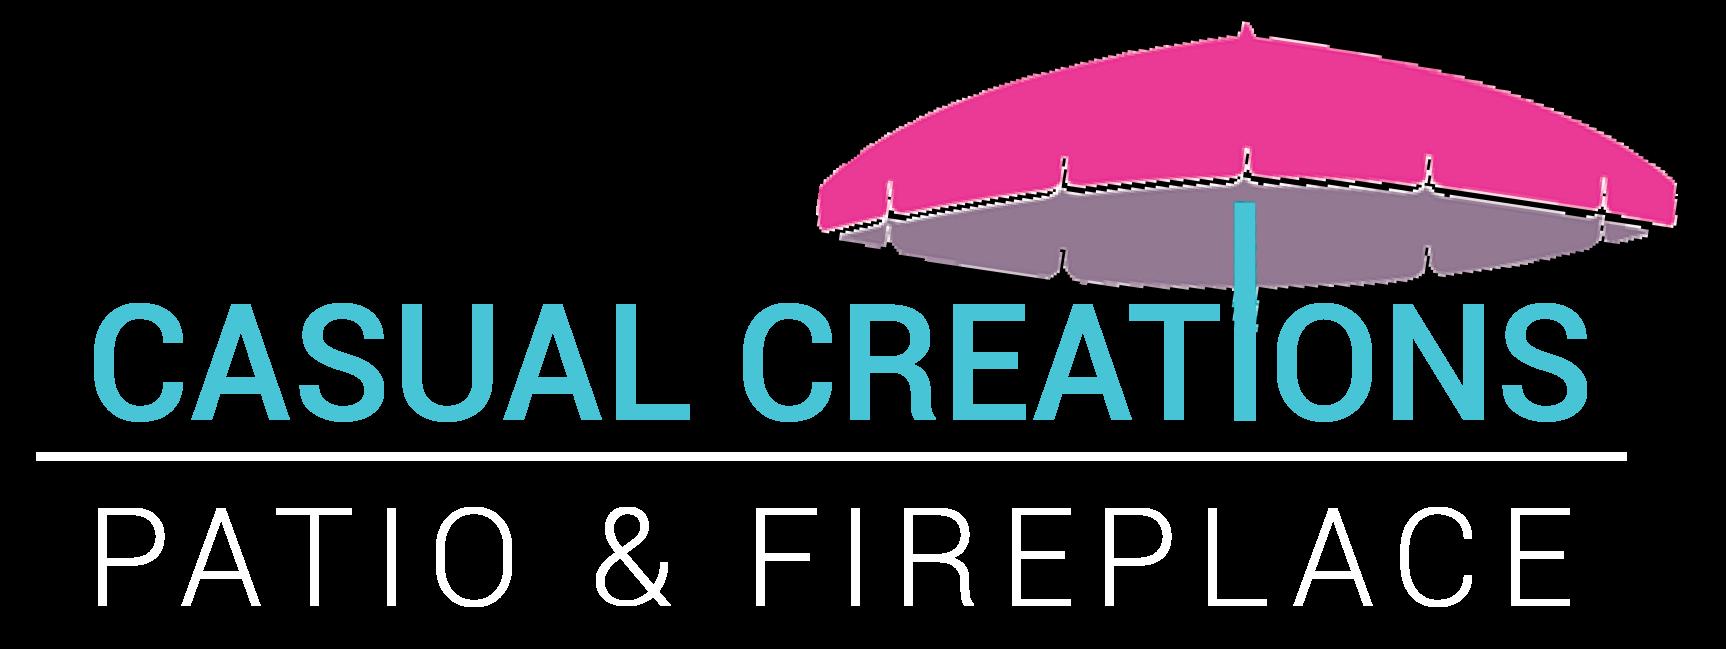 Casual Creations logo